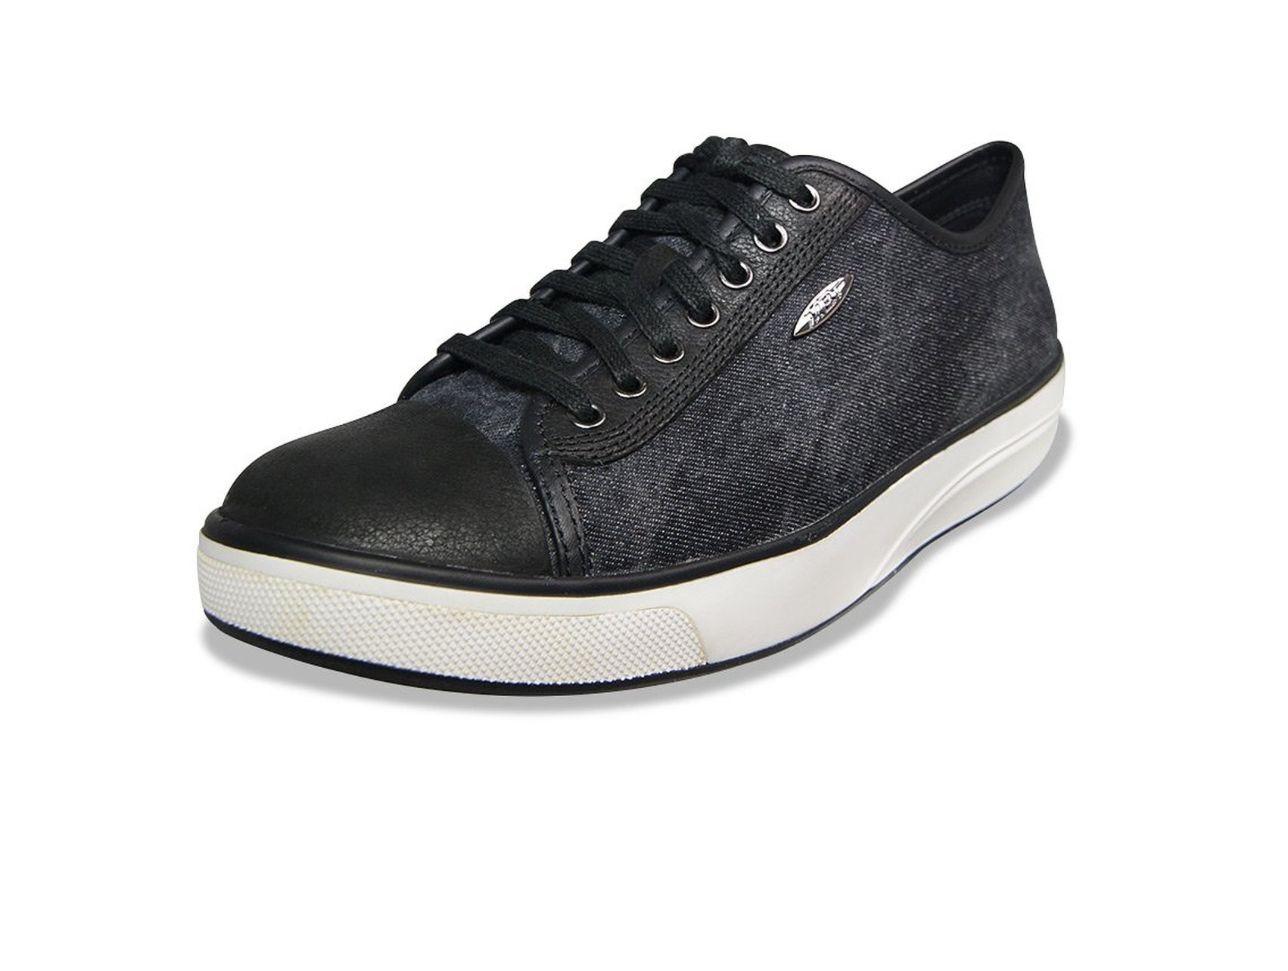 MBT femmes  Jambo (LE) Athletic Walking  Chaussures  - ( noir  Stone Washed Denim)